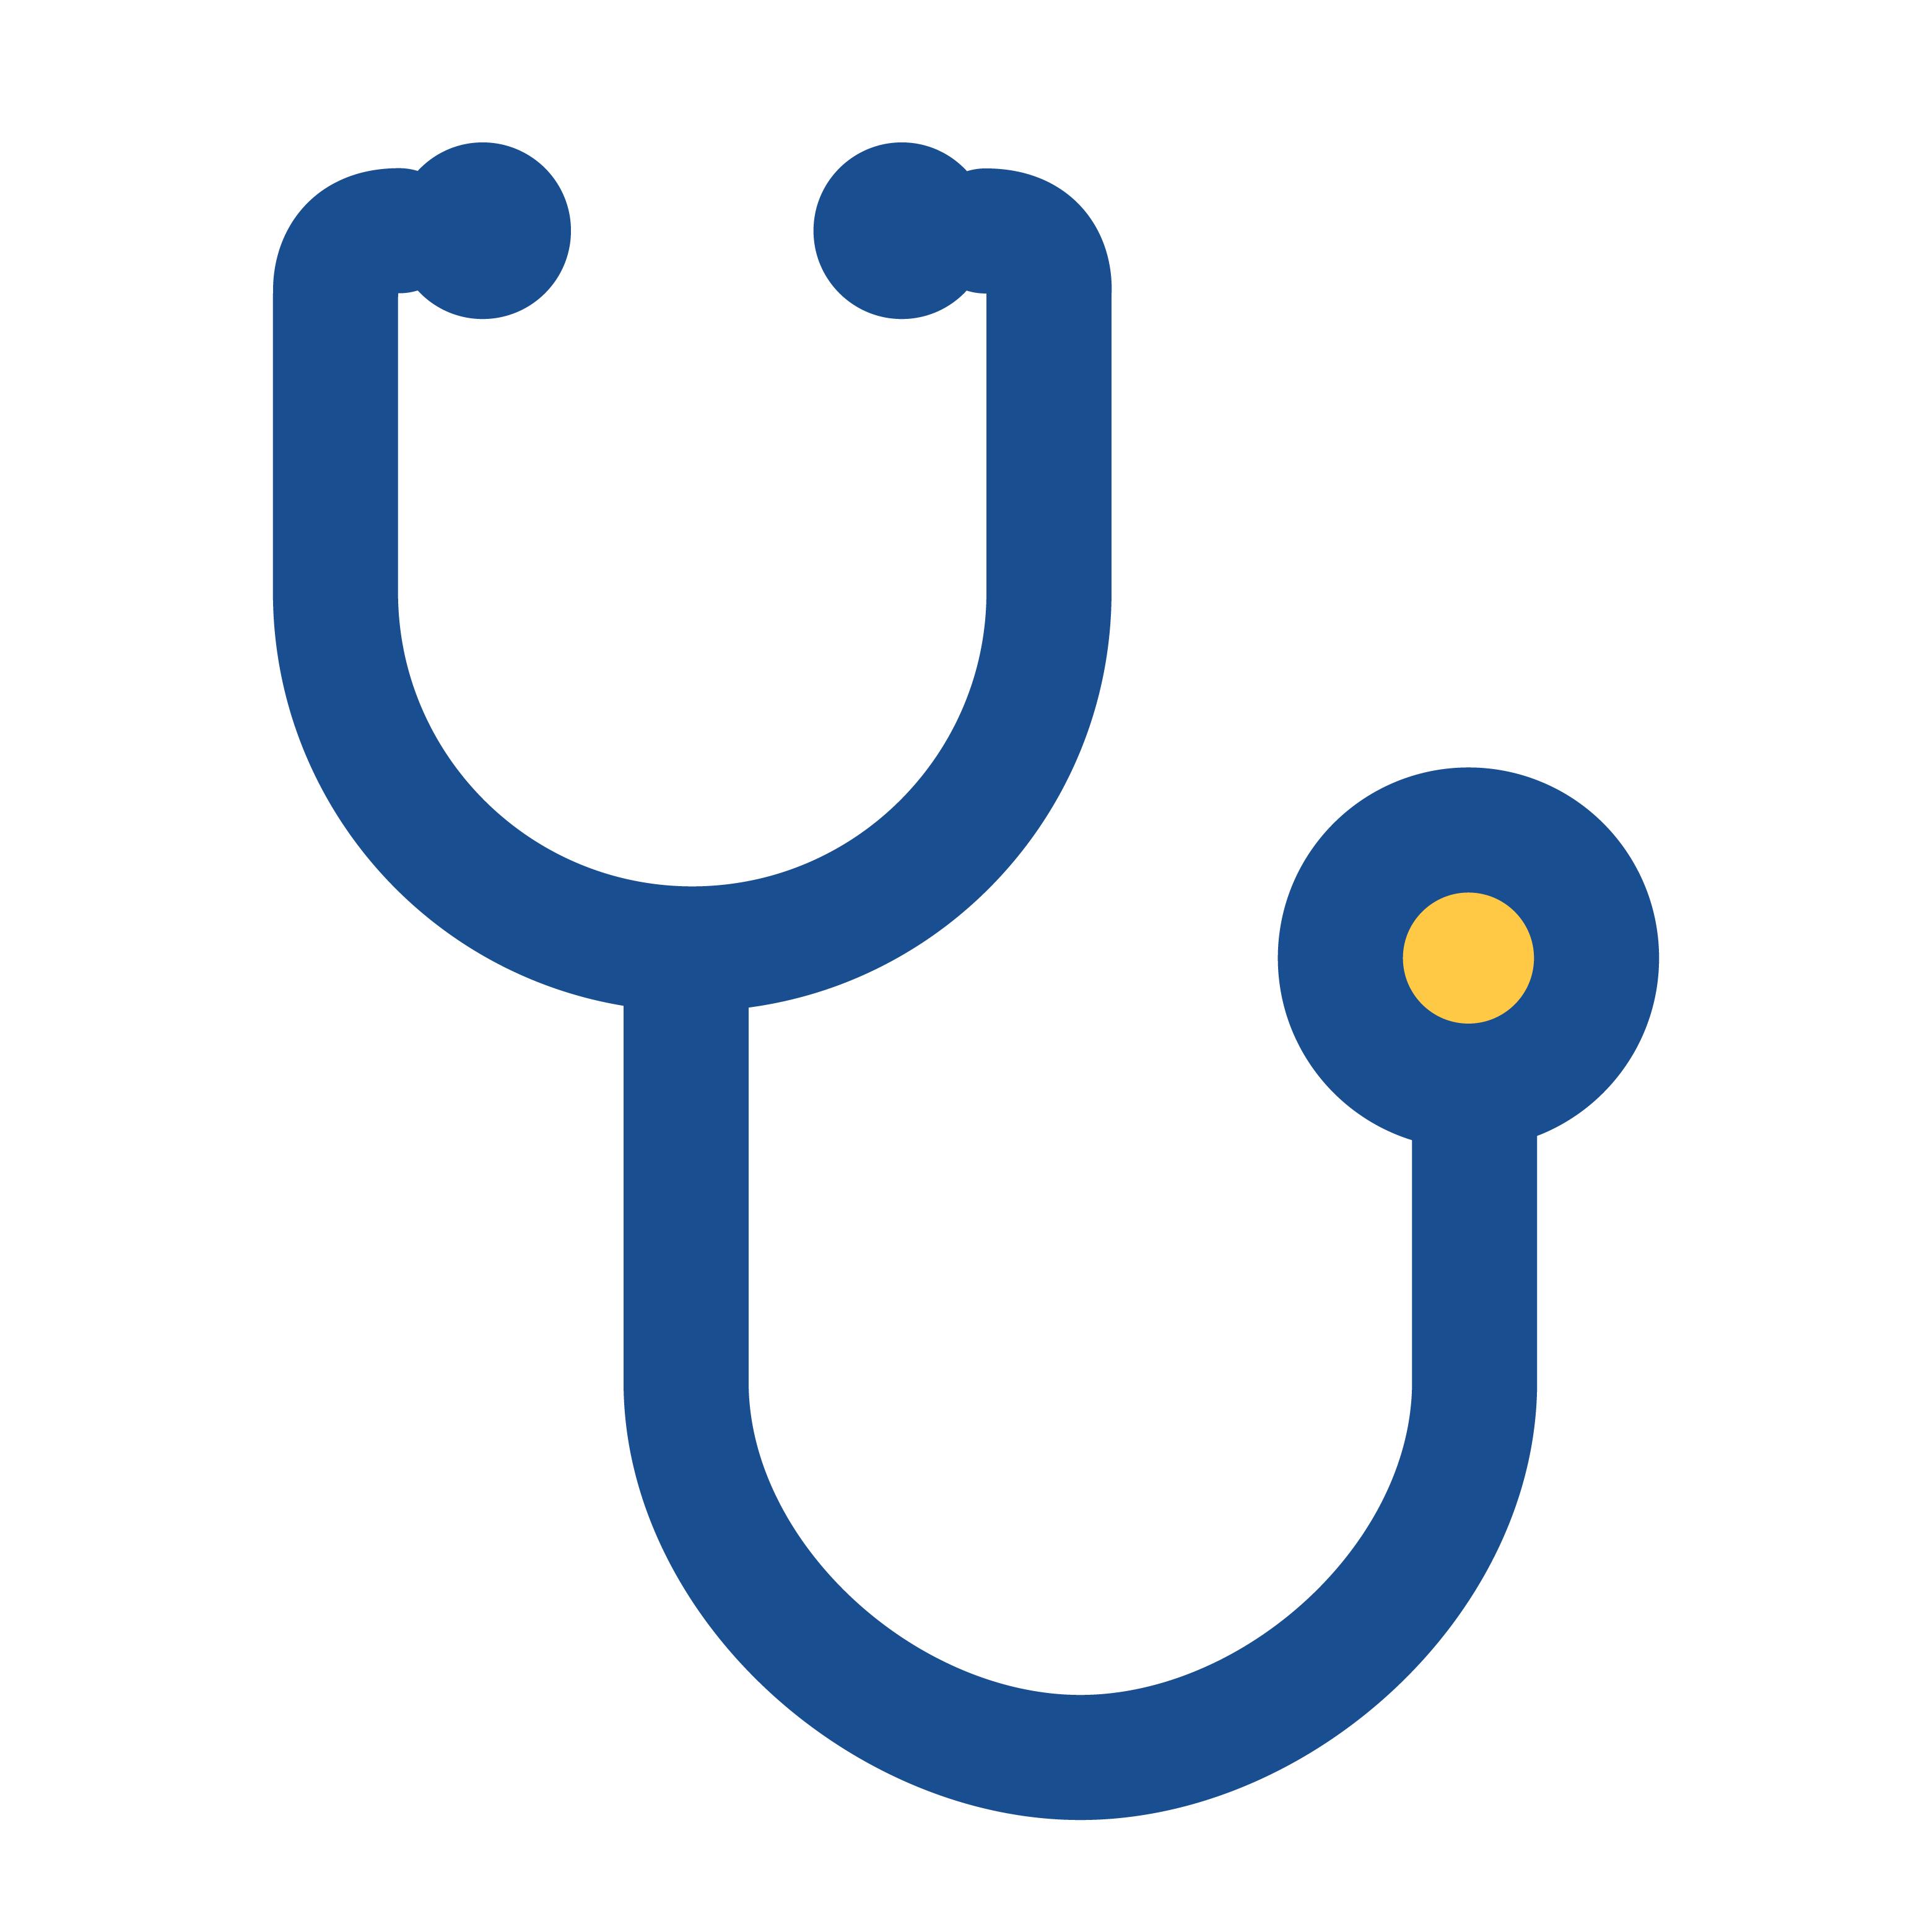 wv caring - receive diagnosis